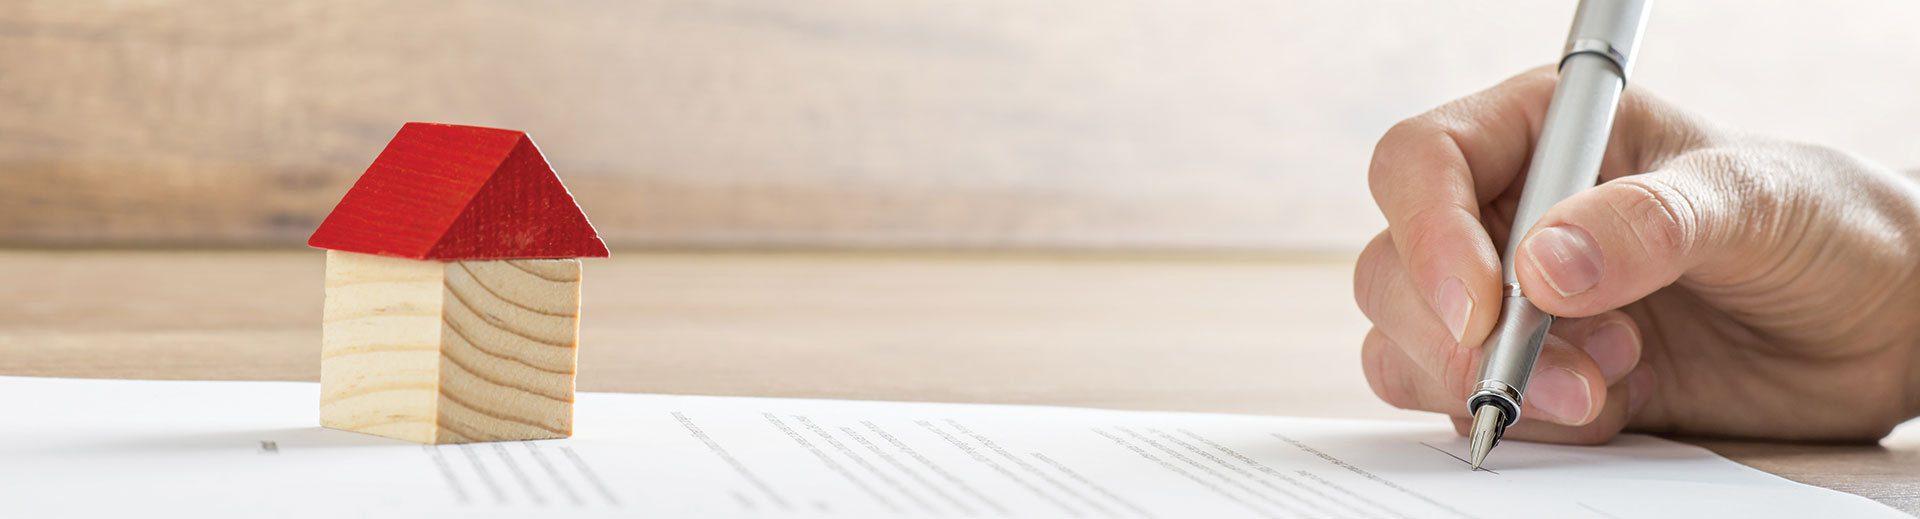 Home Finance, Home Loans